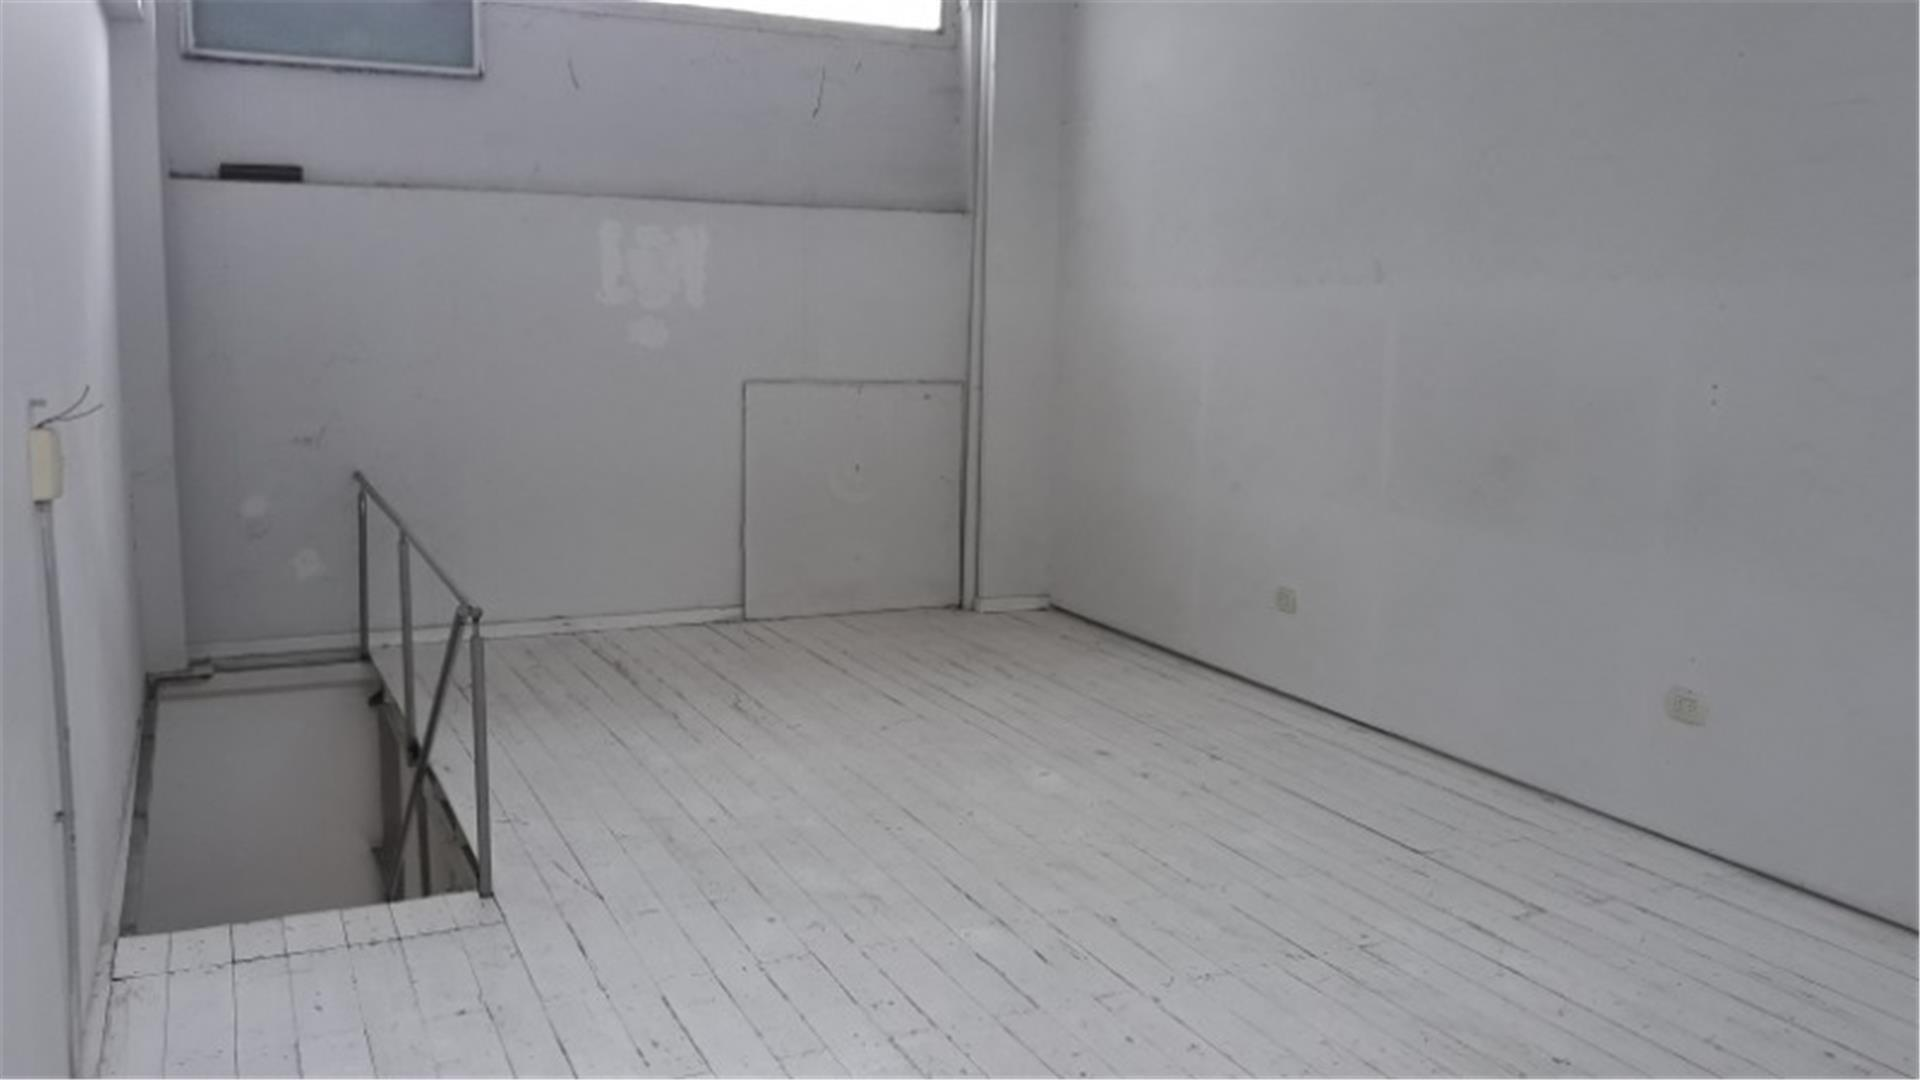 Armengol Tecera 1200 - $ 9.500 - Oficina Alquiler